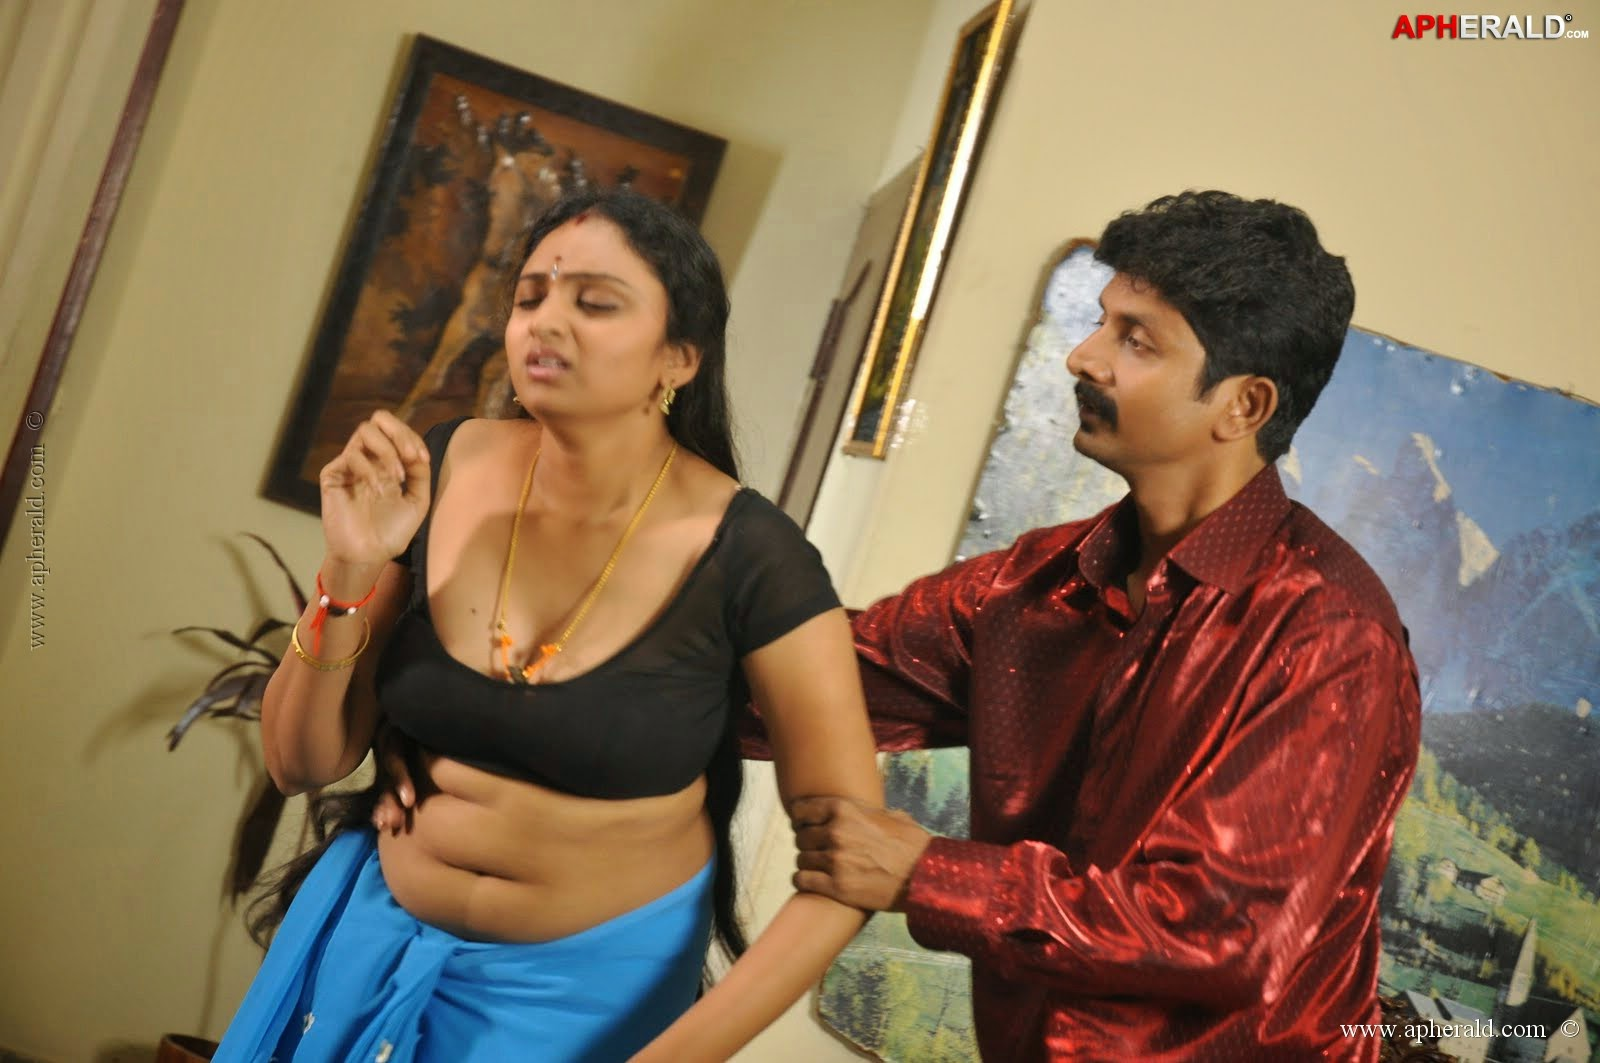 Hot movie anagarigam tamil